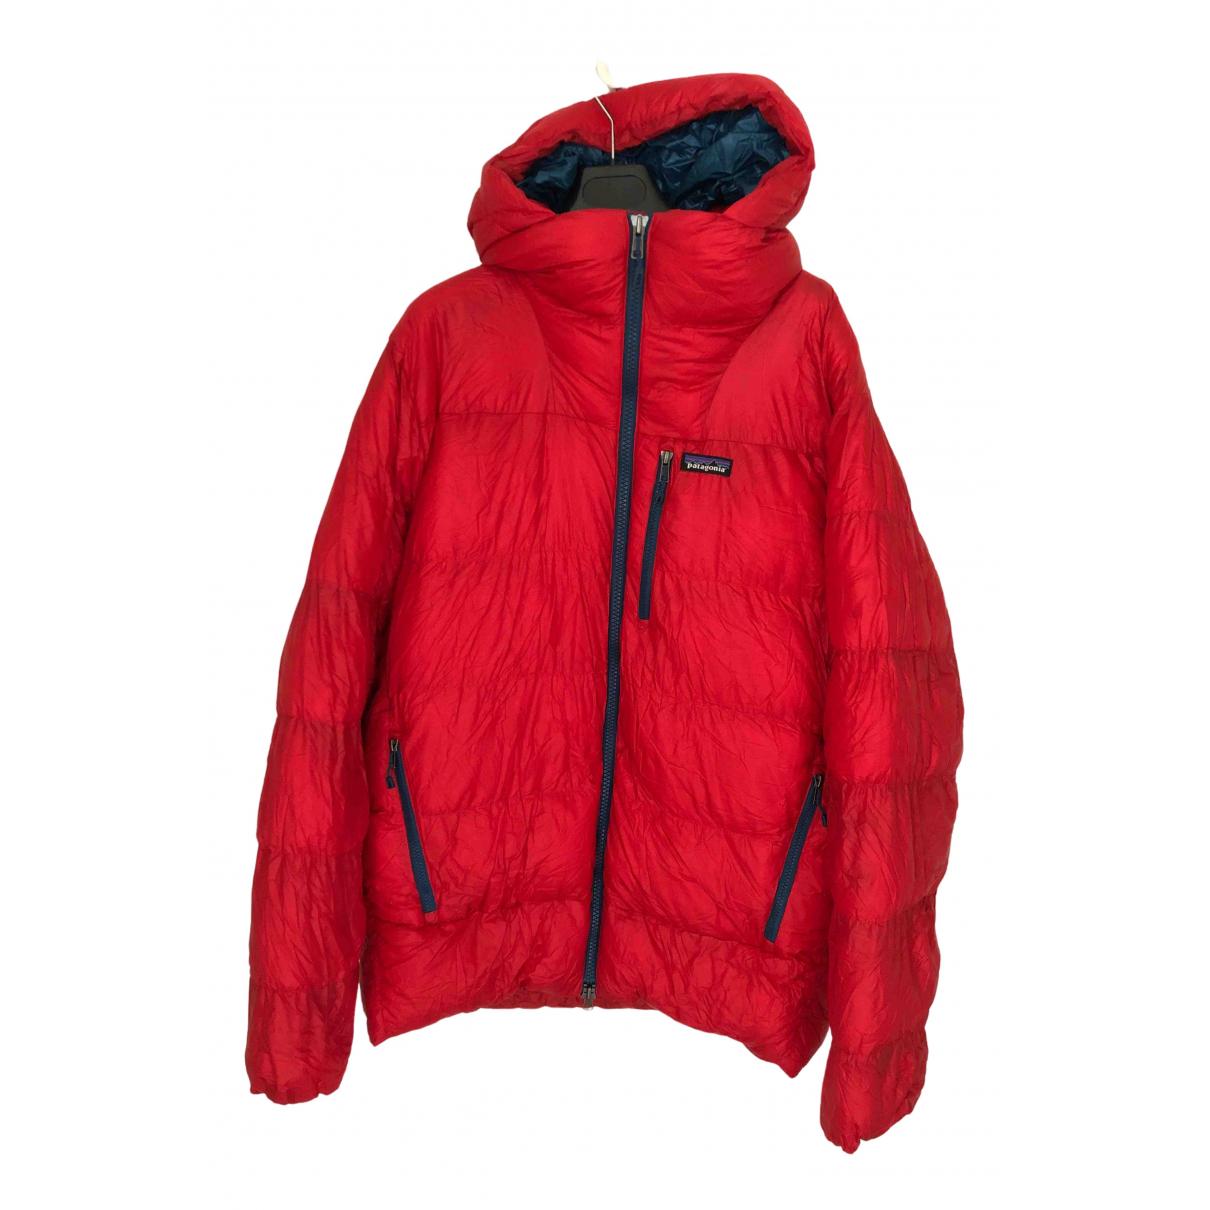 Patagonia \N Jacke in  Rot Polyester